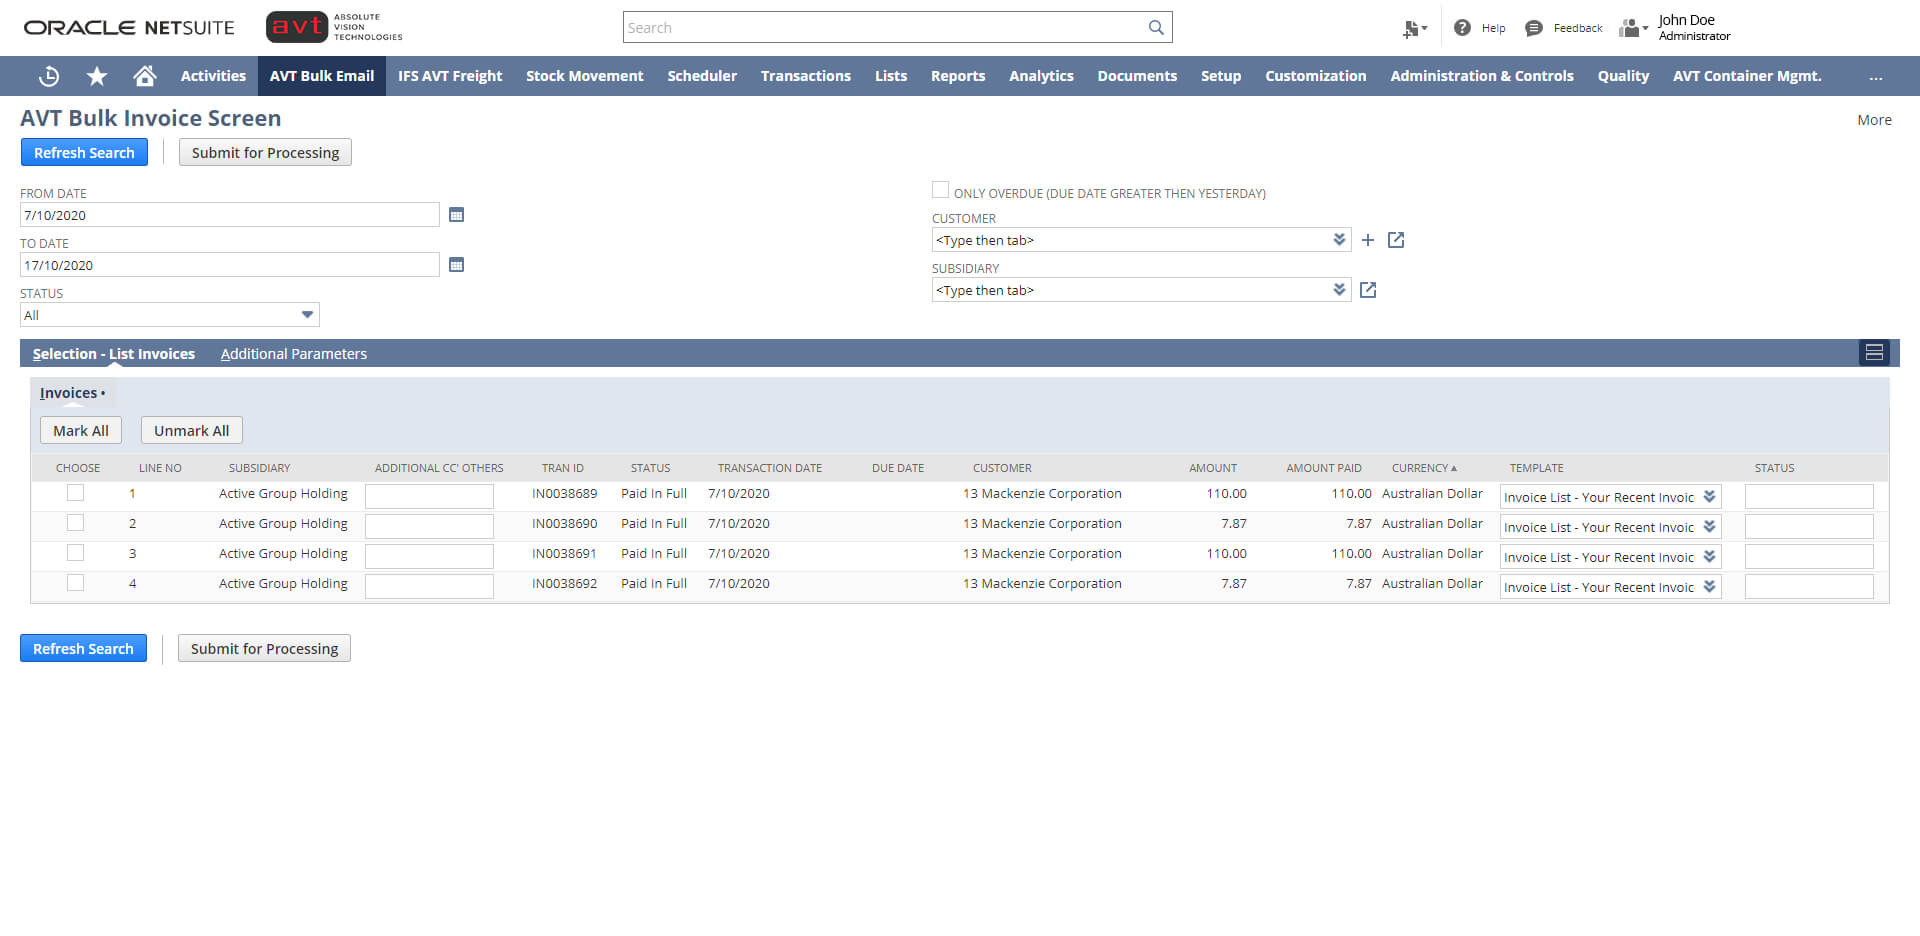 AVT Bulk Invoicing App - Invoicing Screen